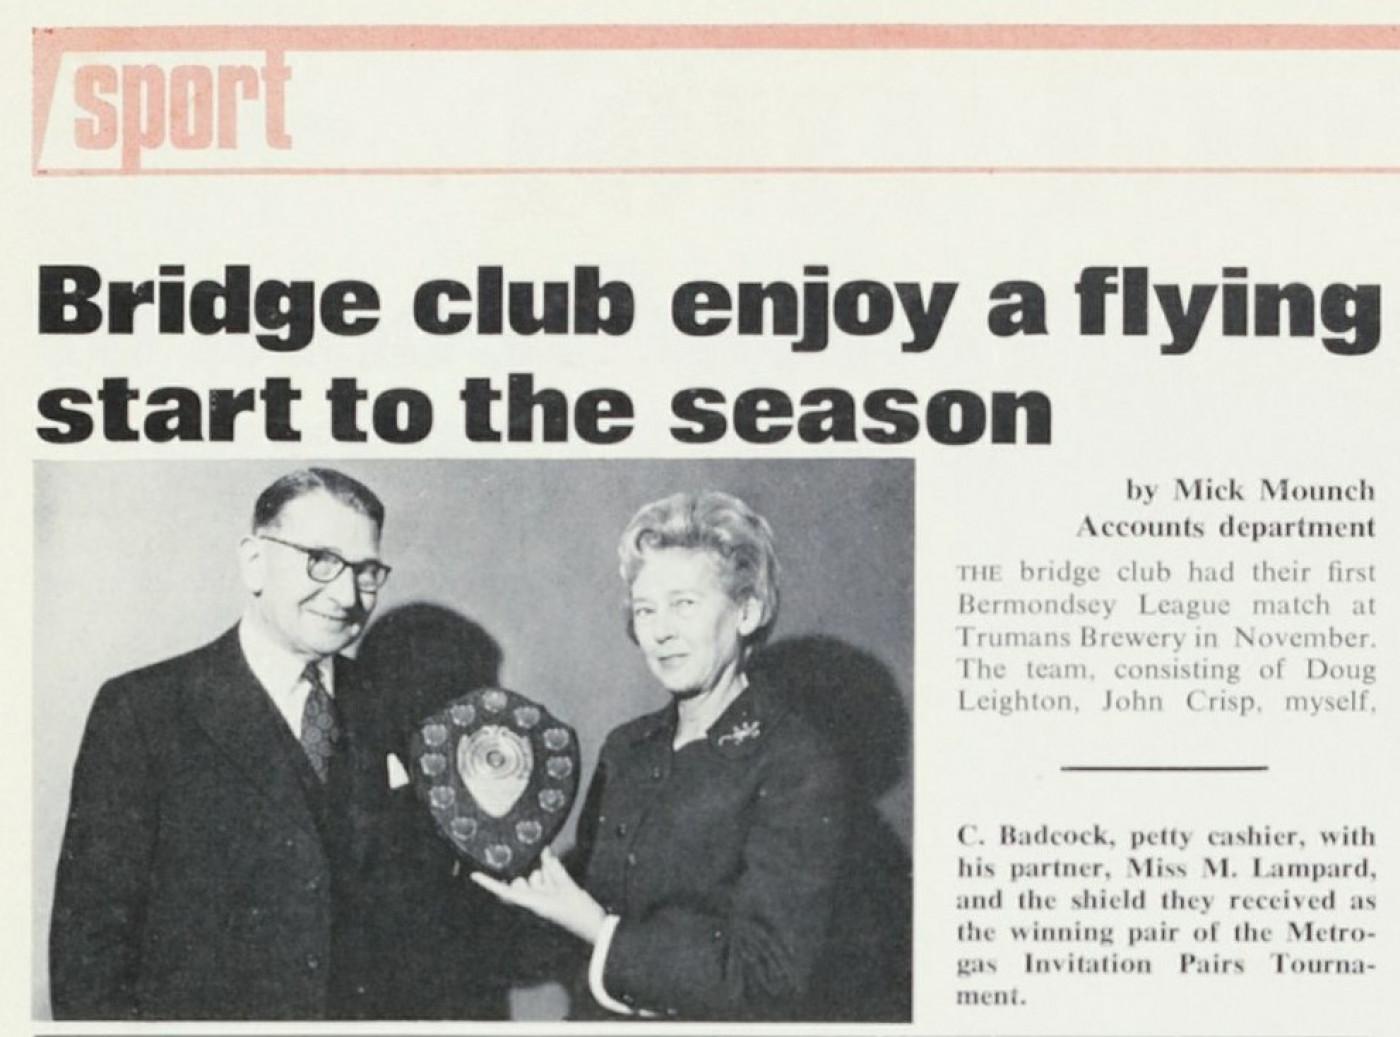 Article on LR's Bridge Club, Society magazine 1973